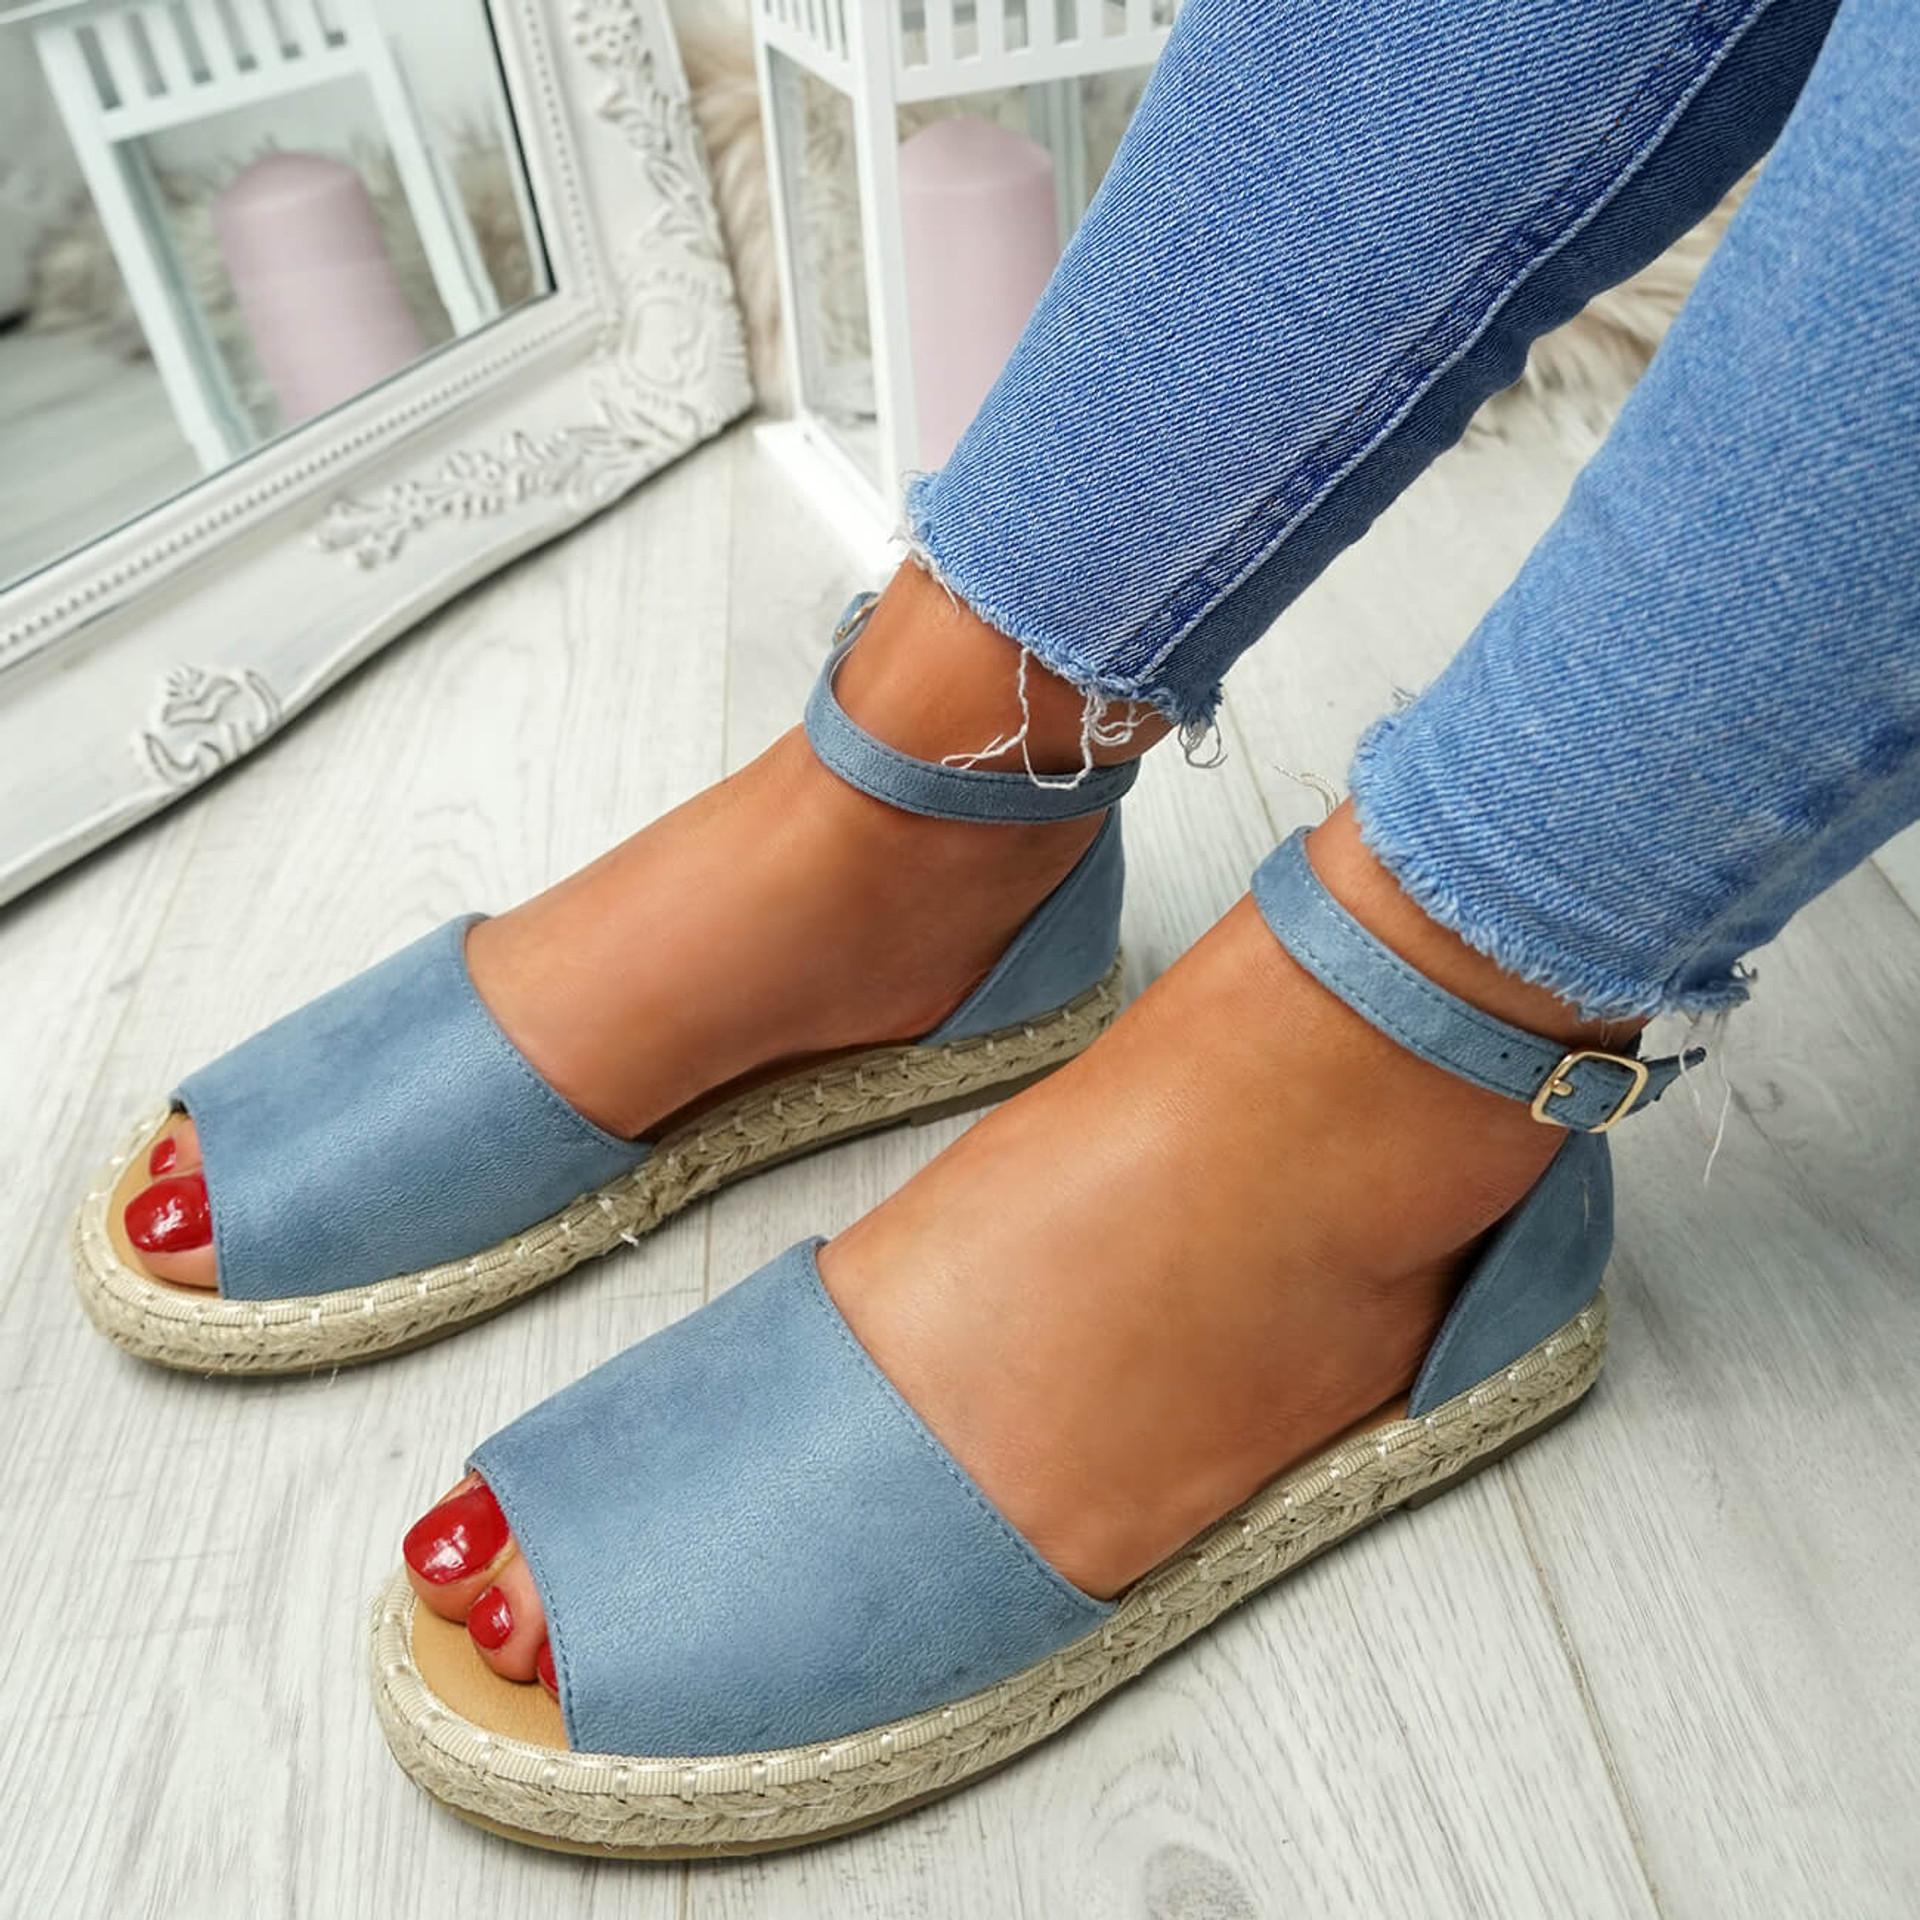 Lorre Blue Espadrille Flat Sandals